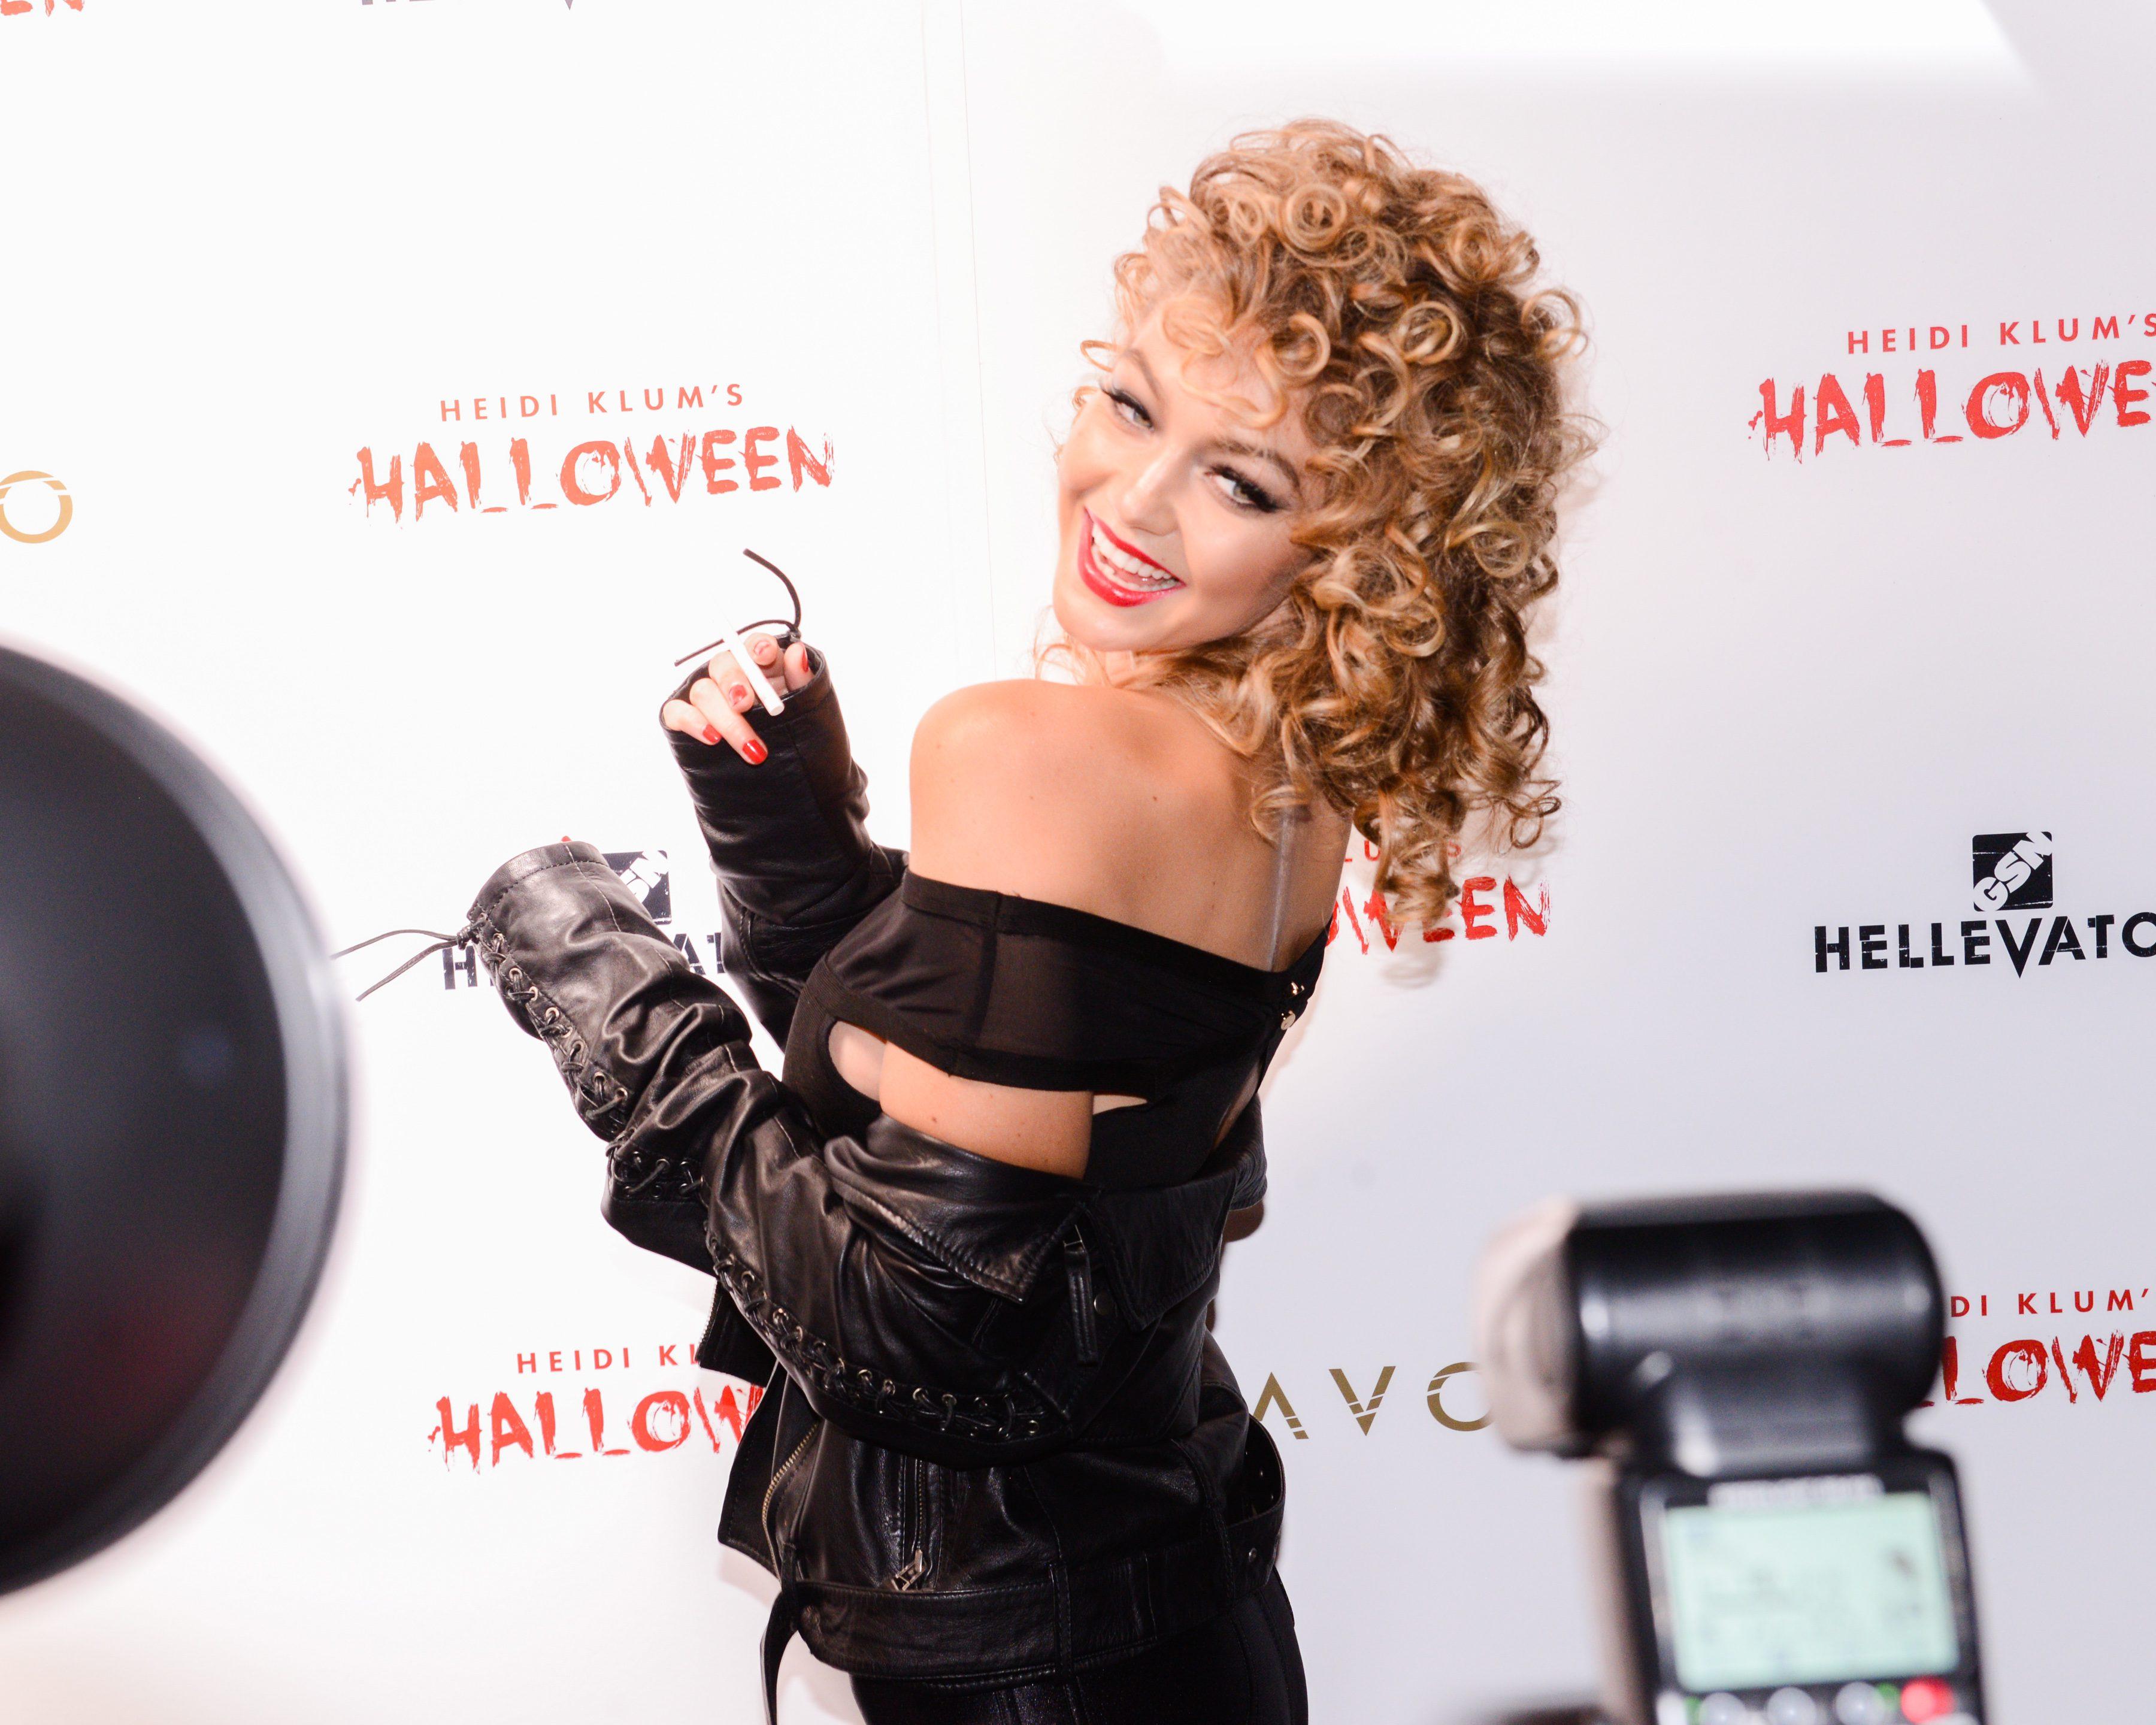 Gigi Hadid at Heidi Klum's 16th Annual Halloween Party